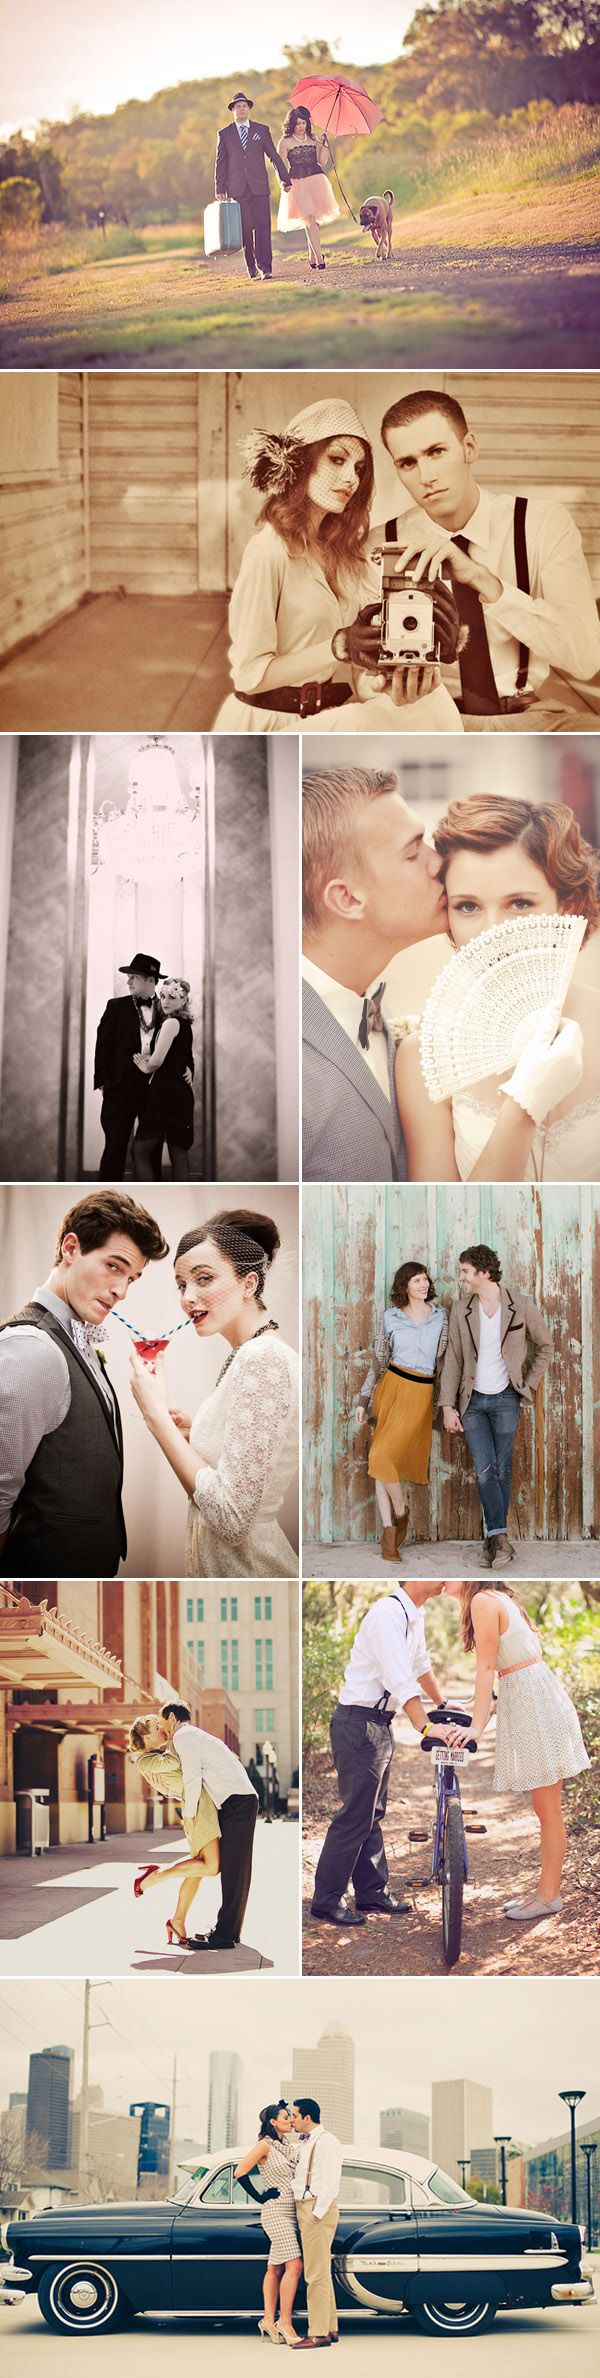 vintage inspired wedding photo ideas